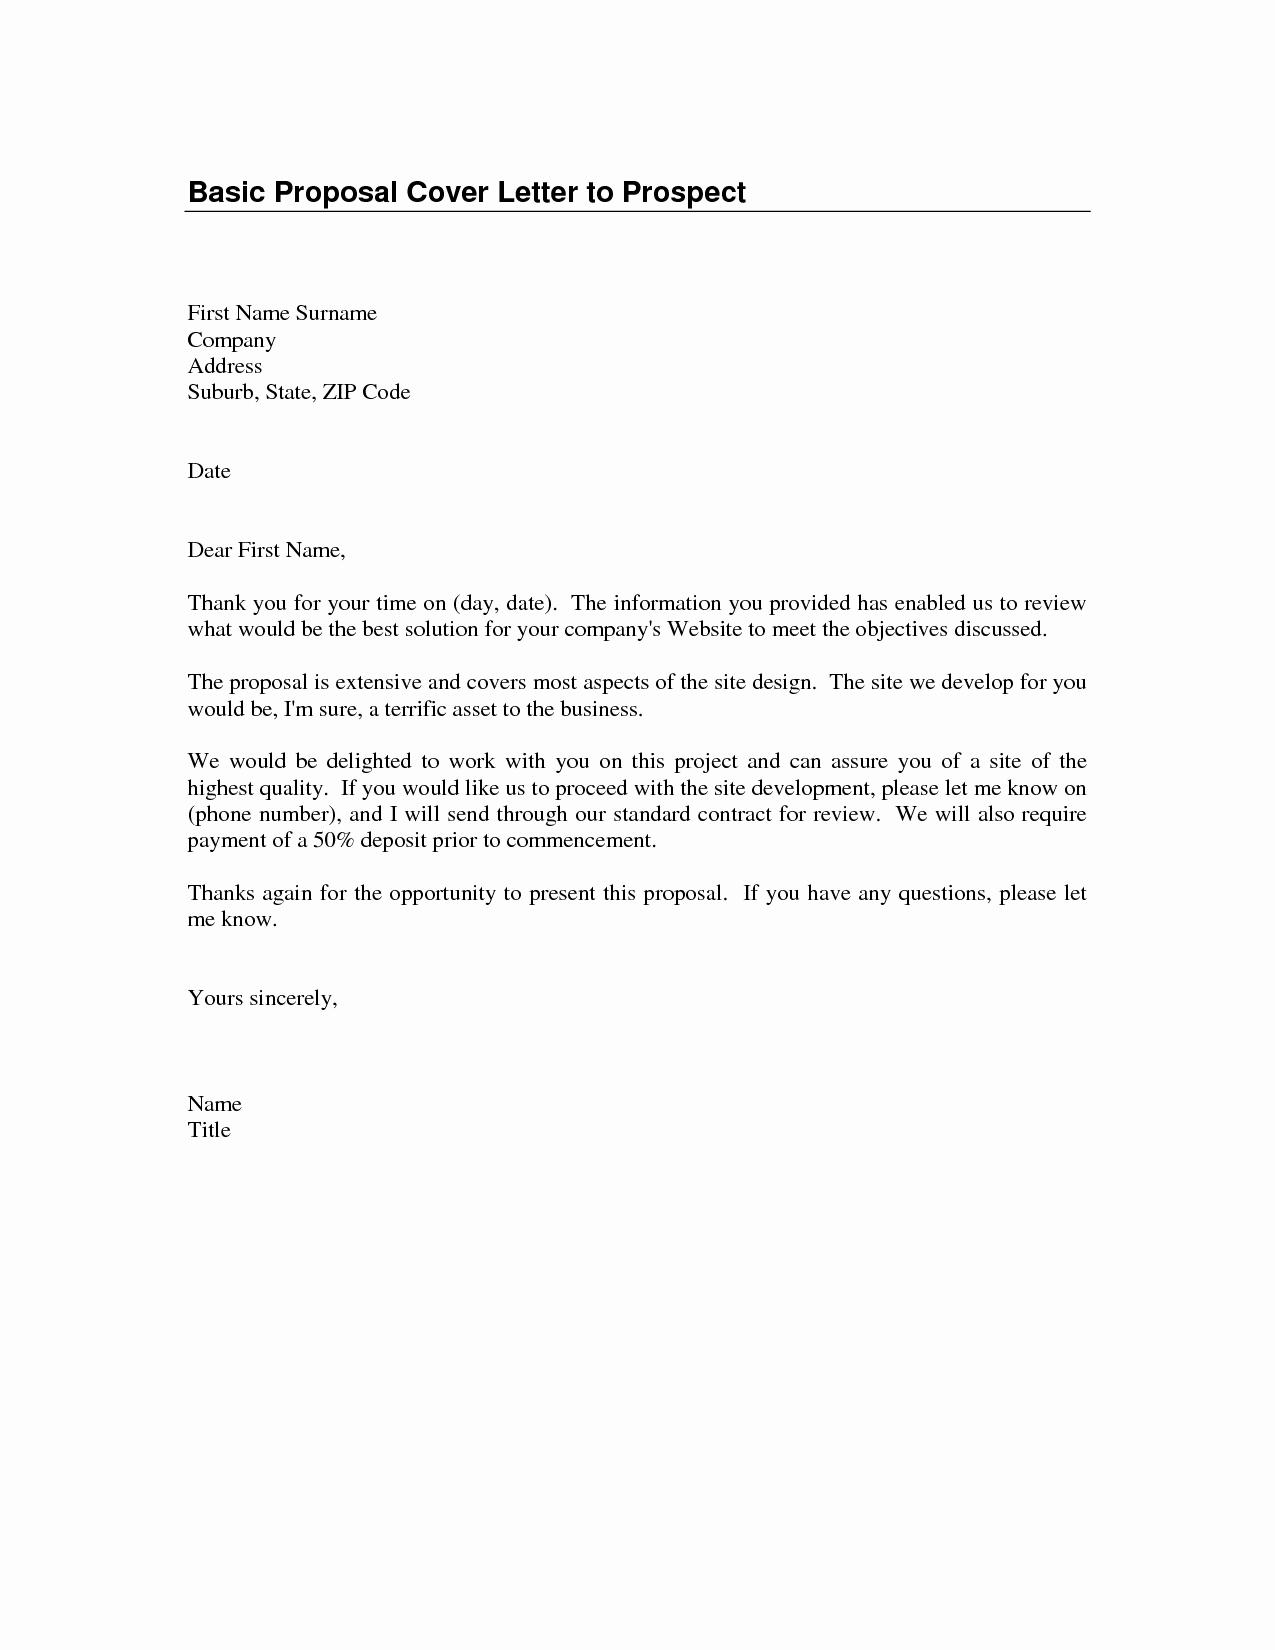 Basic Cover Letter Sample Basic Cover Letters Free